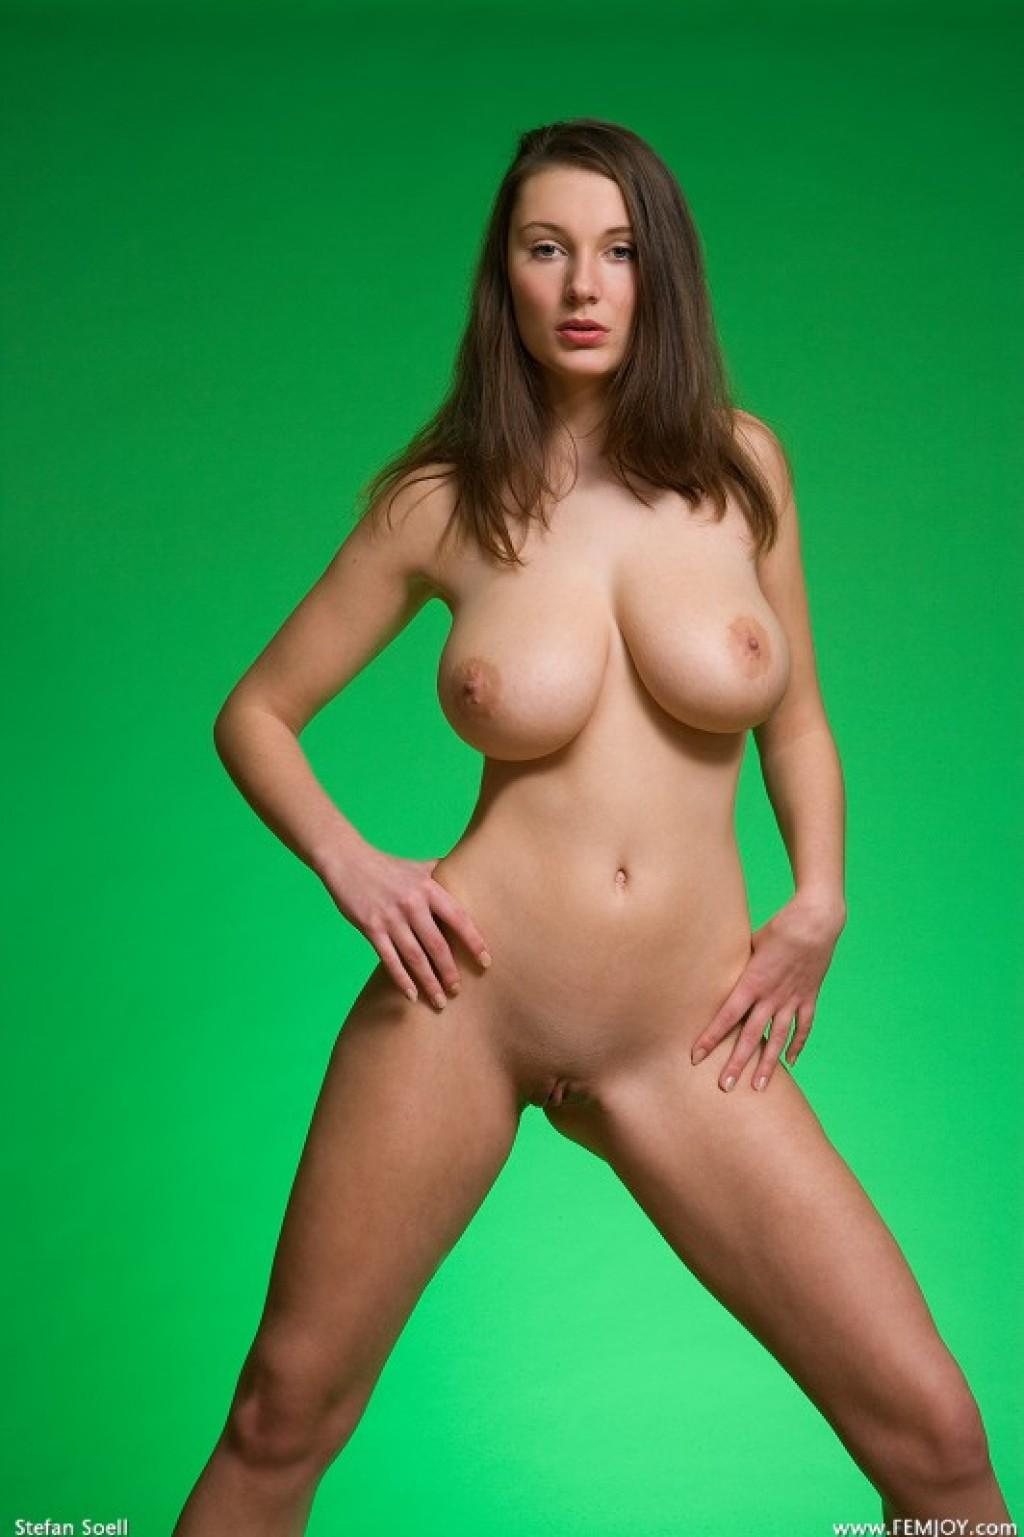 tall nude girl nature